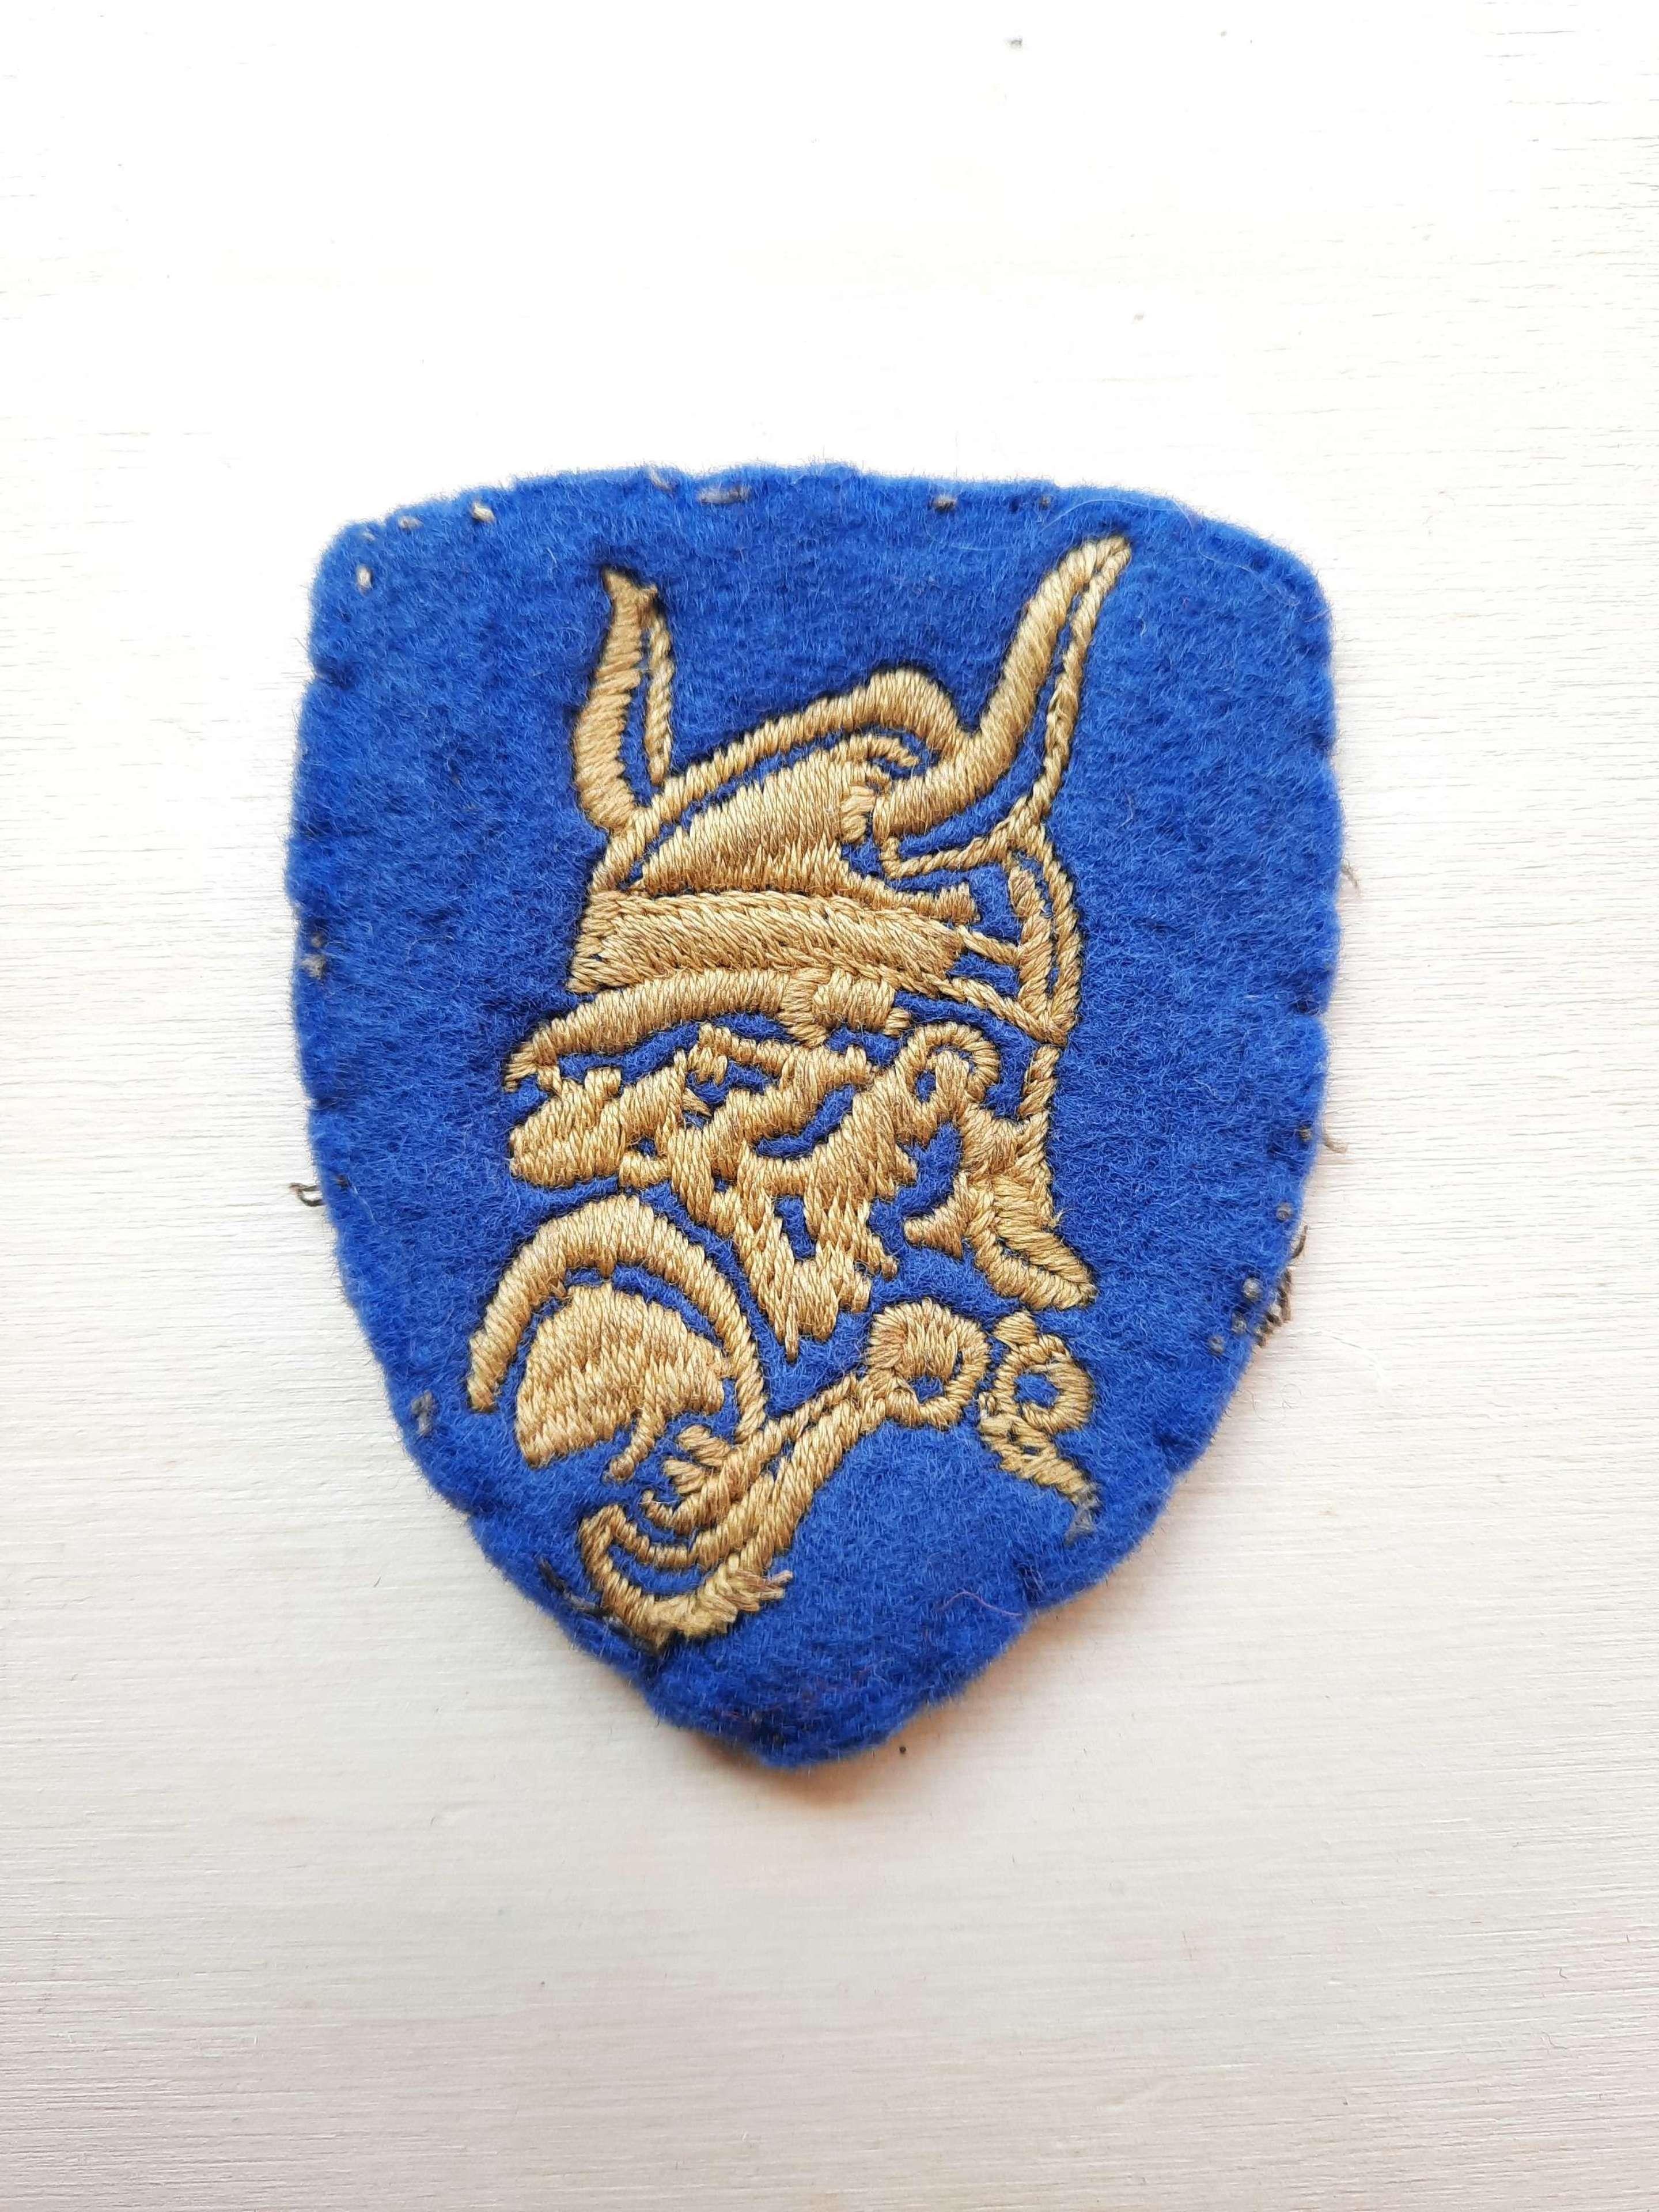 East Anglian Training Brigade Patch